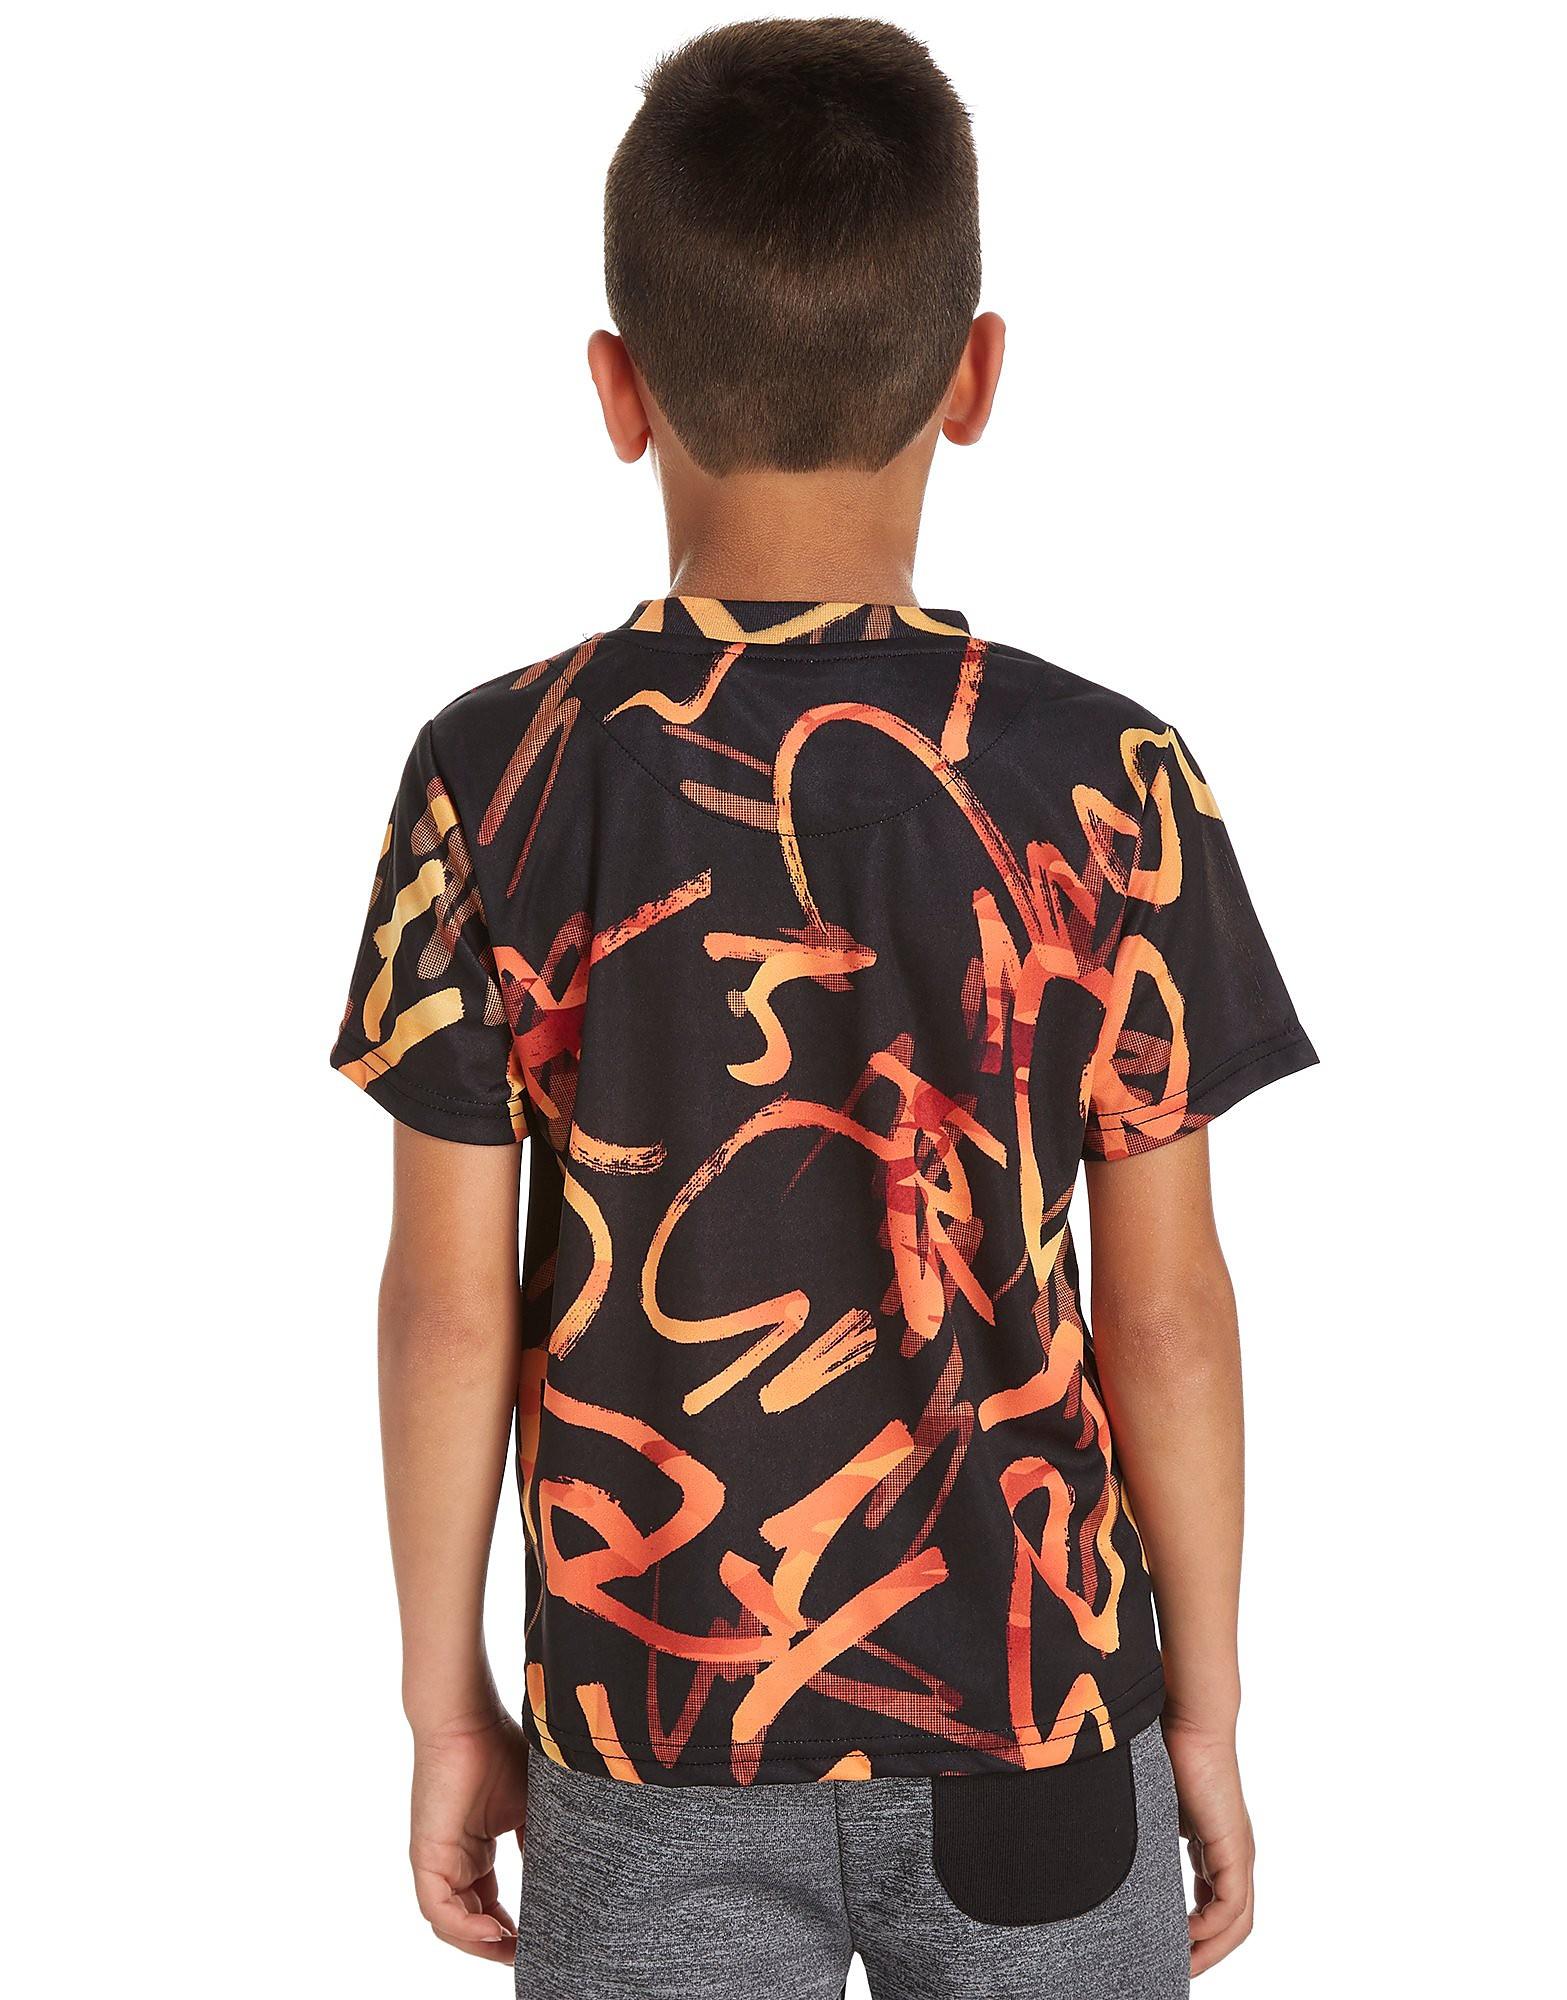 Sonneti Dimil T-Shirt Childrens